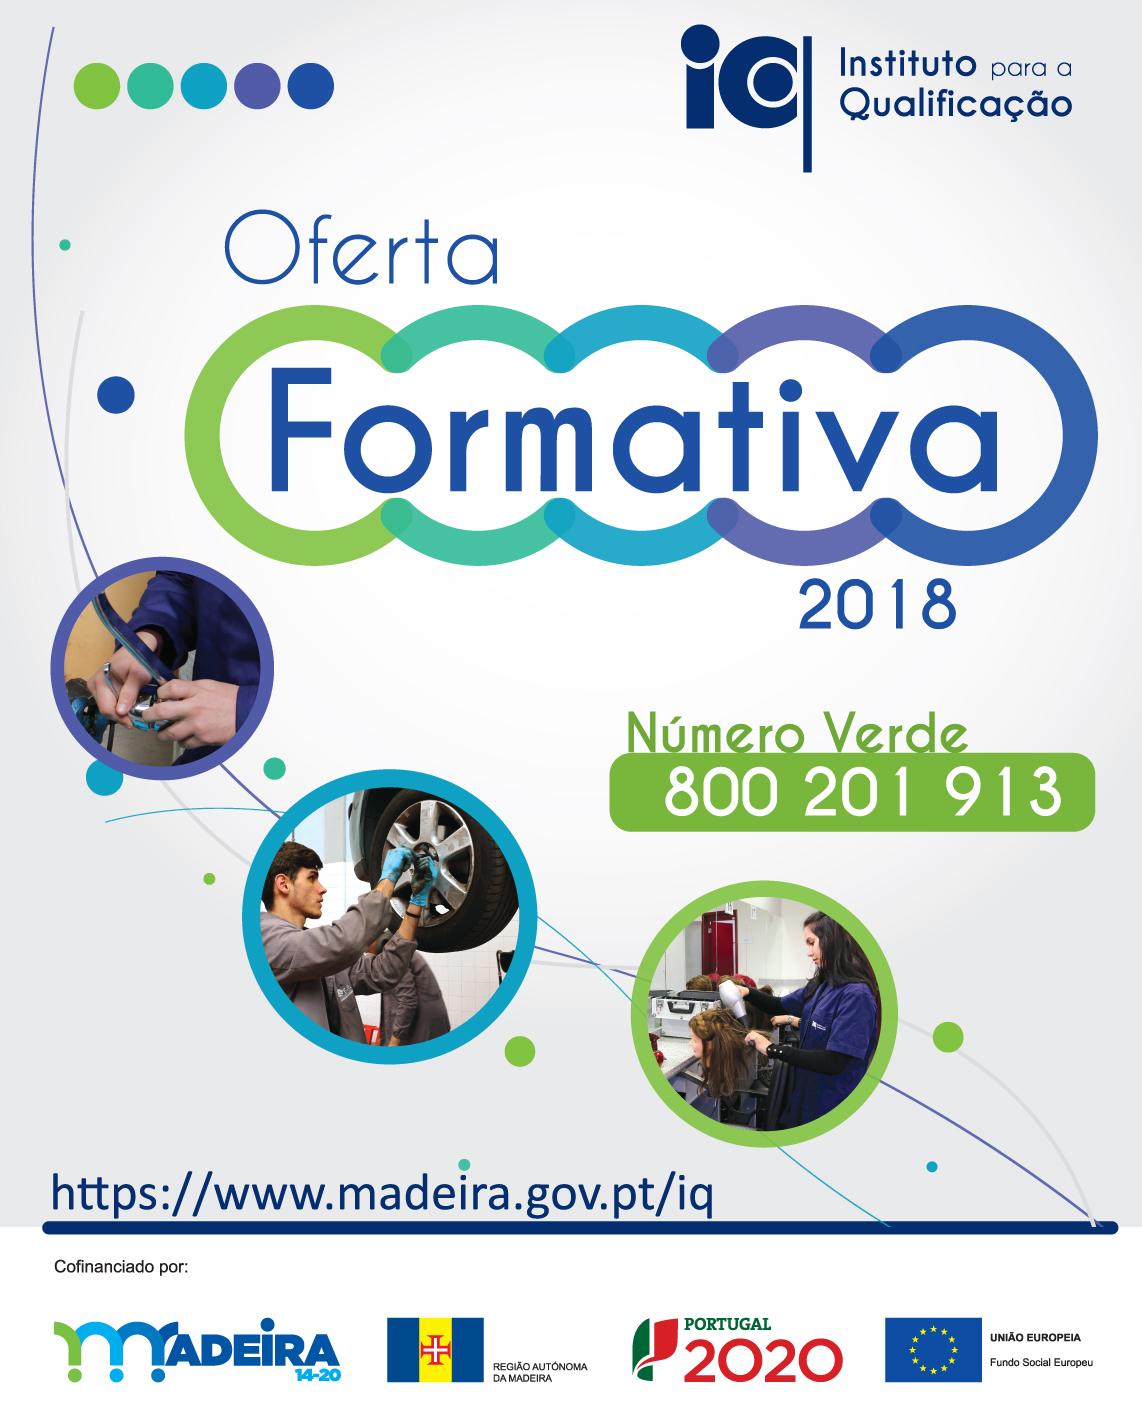 Oferta Formativa 2018